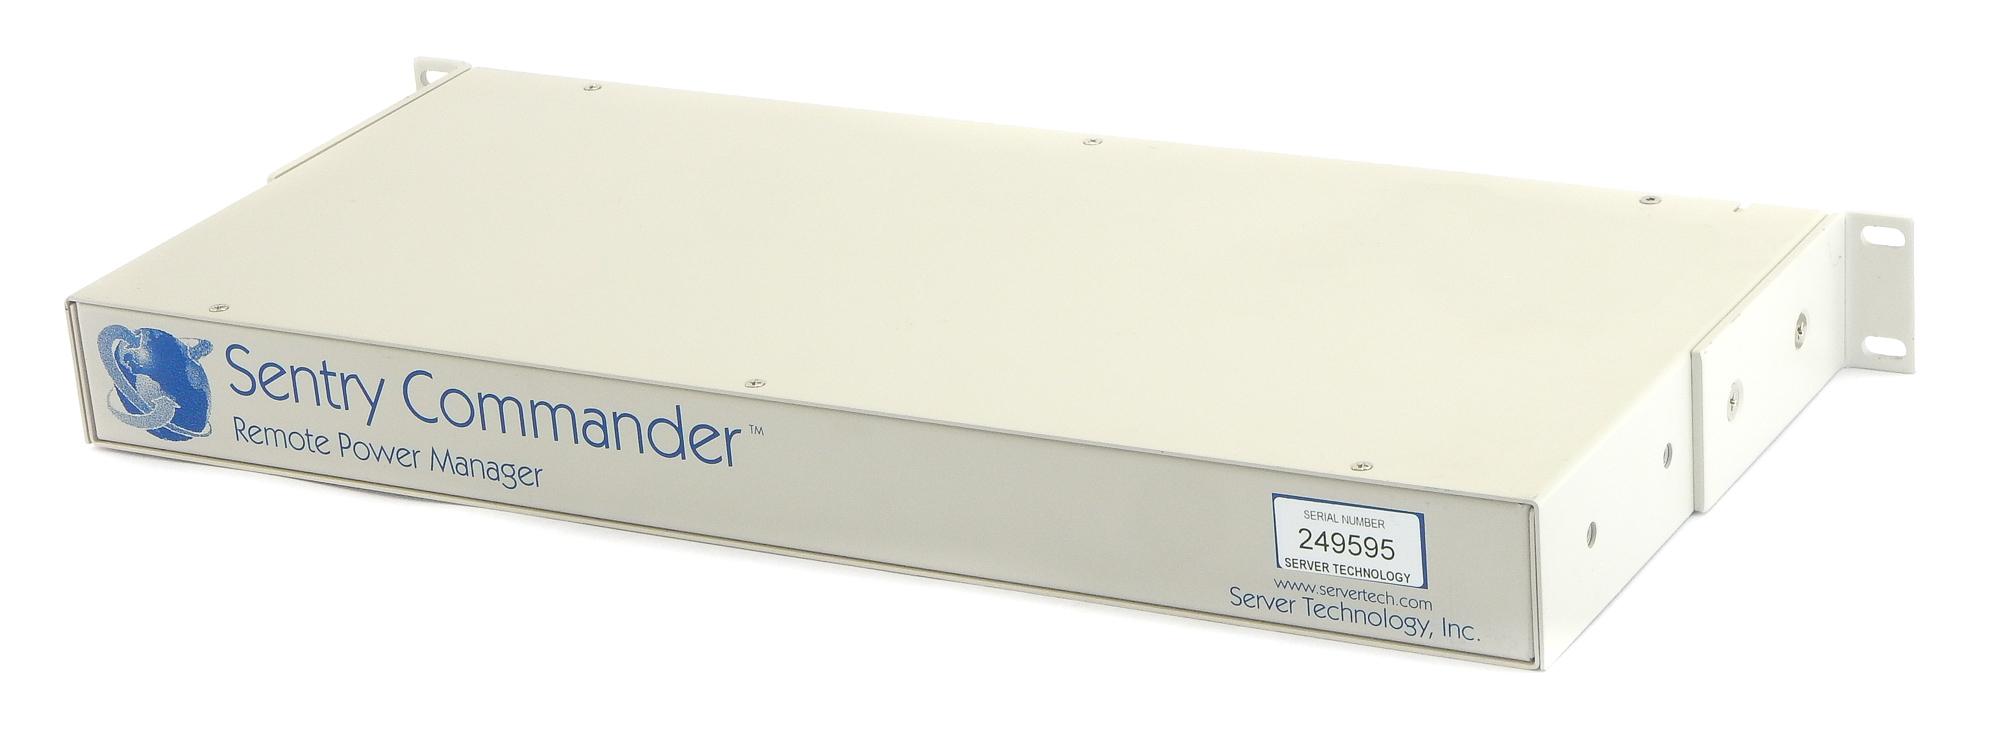 PT45-H404-2-07 Sentry Commander Remote Power Manager